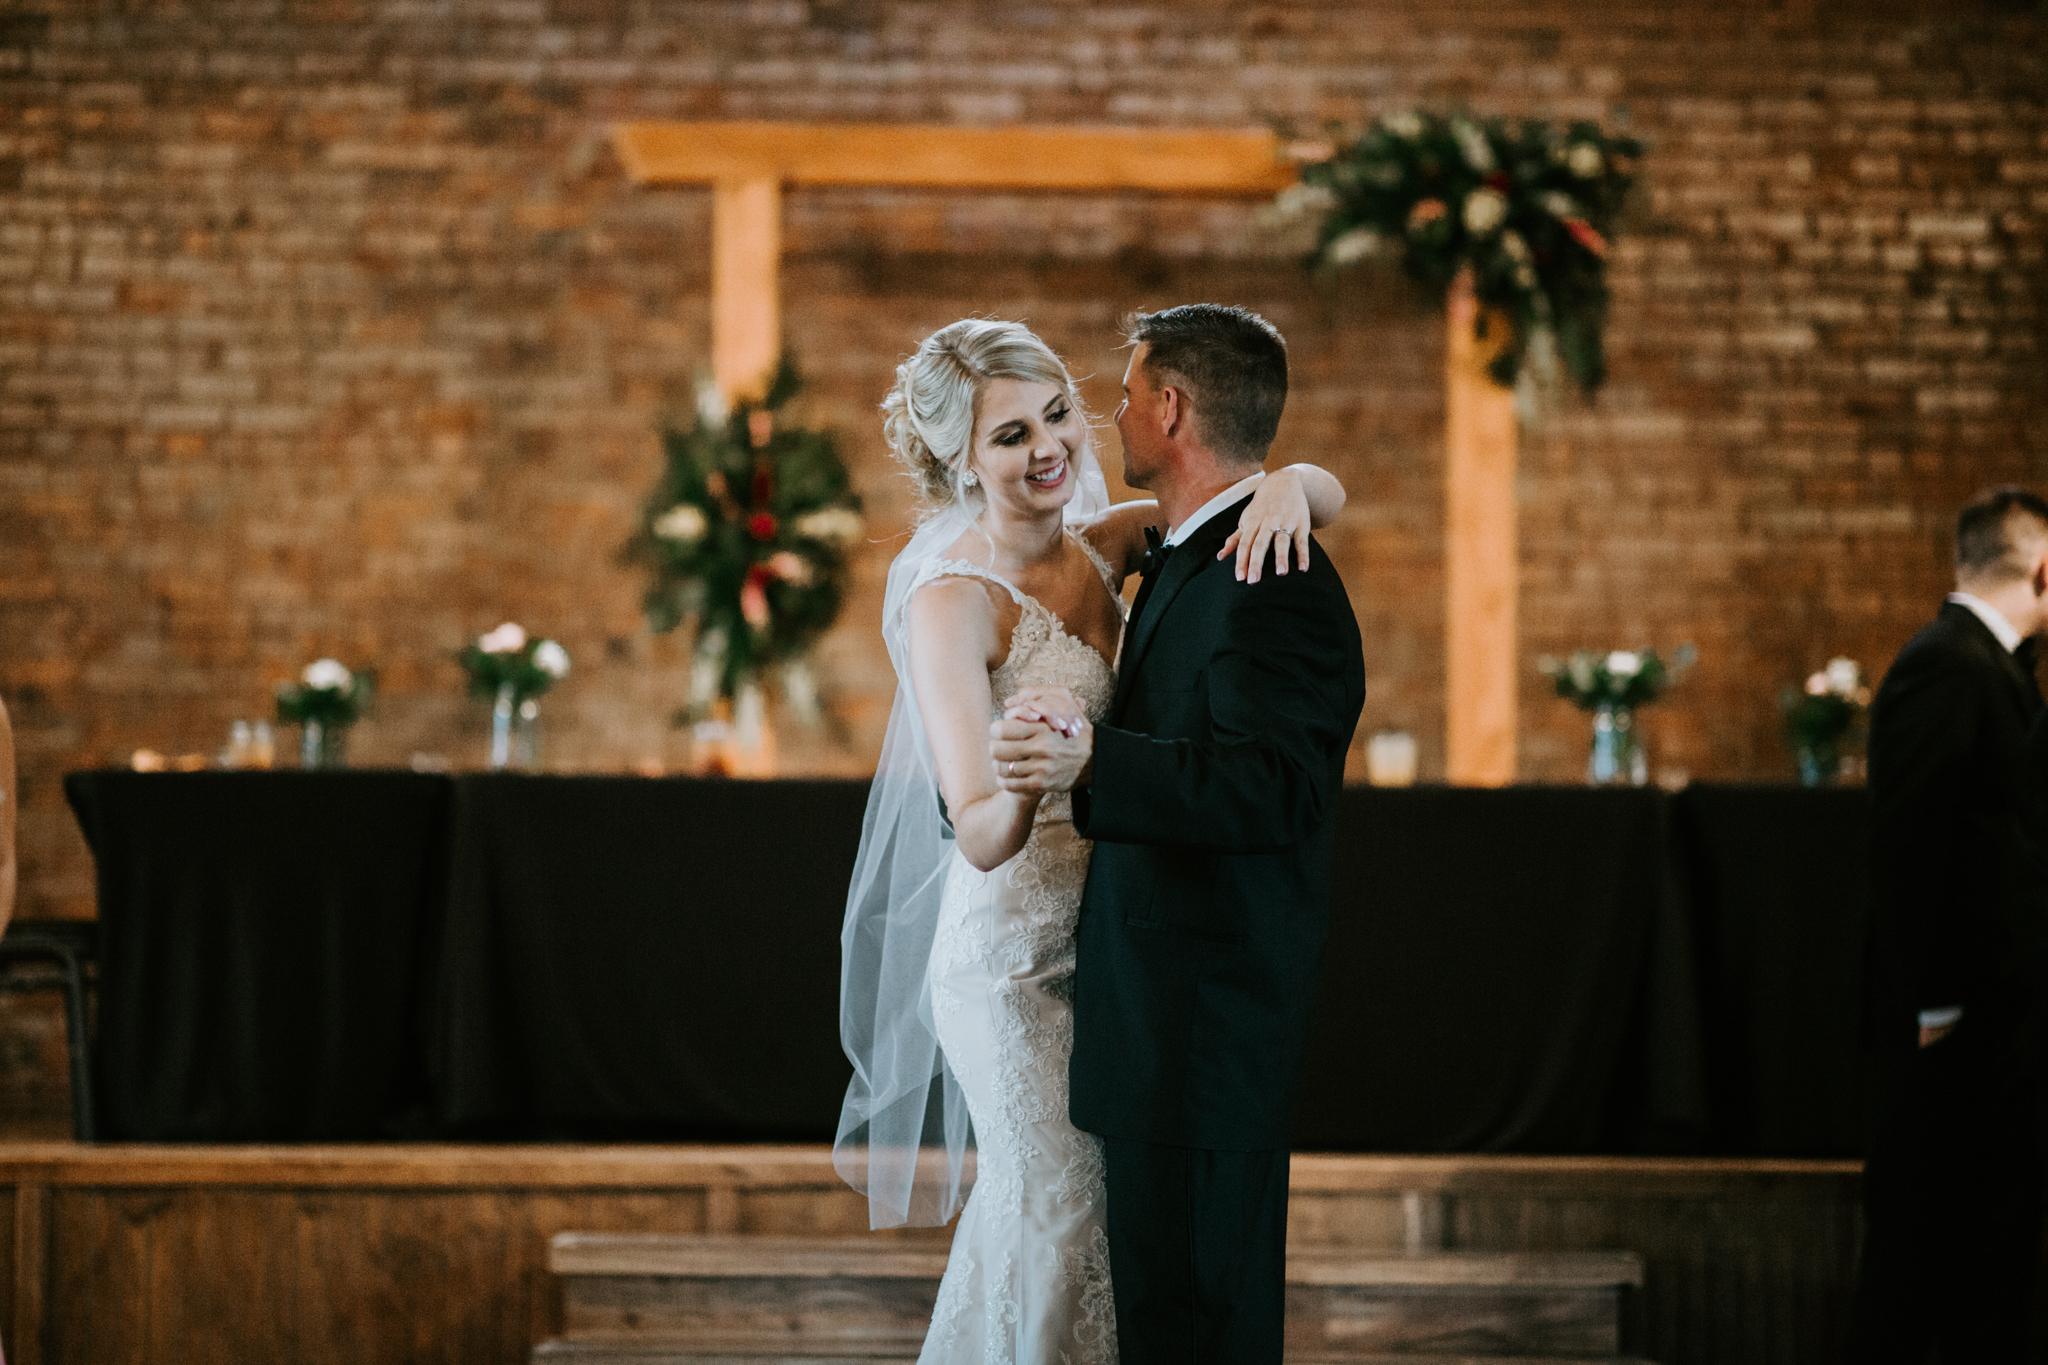 Kayley + Robert + Chattanooga + Nashville + Tennessee + Wedding + Photographer-10.jpg